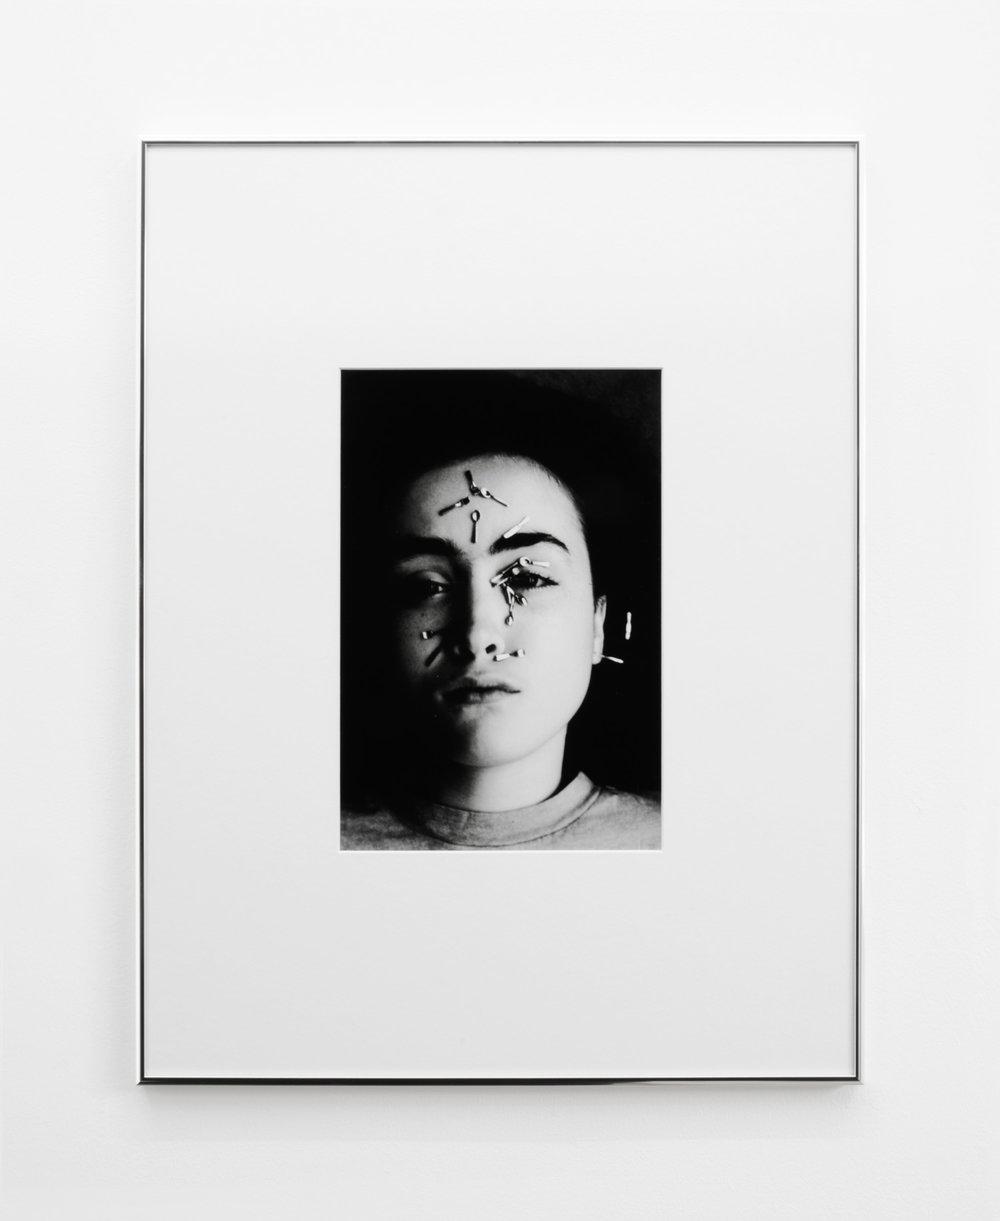 Leda 4 , 2015, 55 x 42cm (framed), Silver Gelatin print.